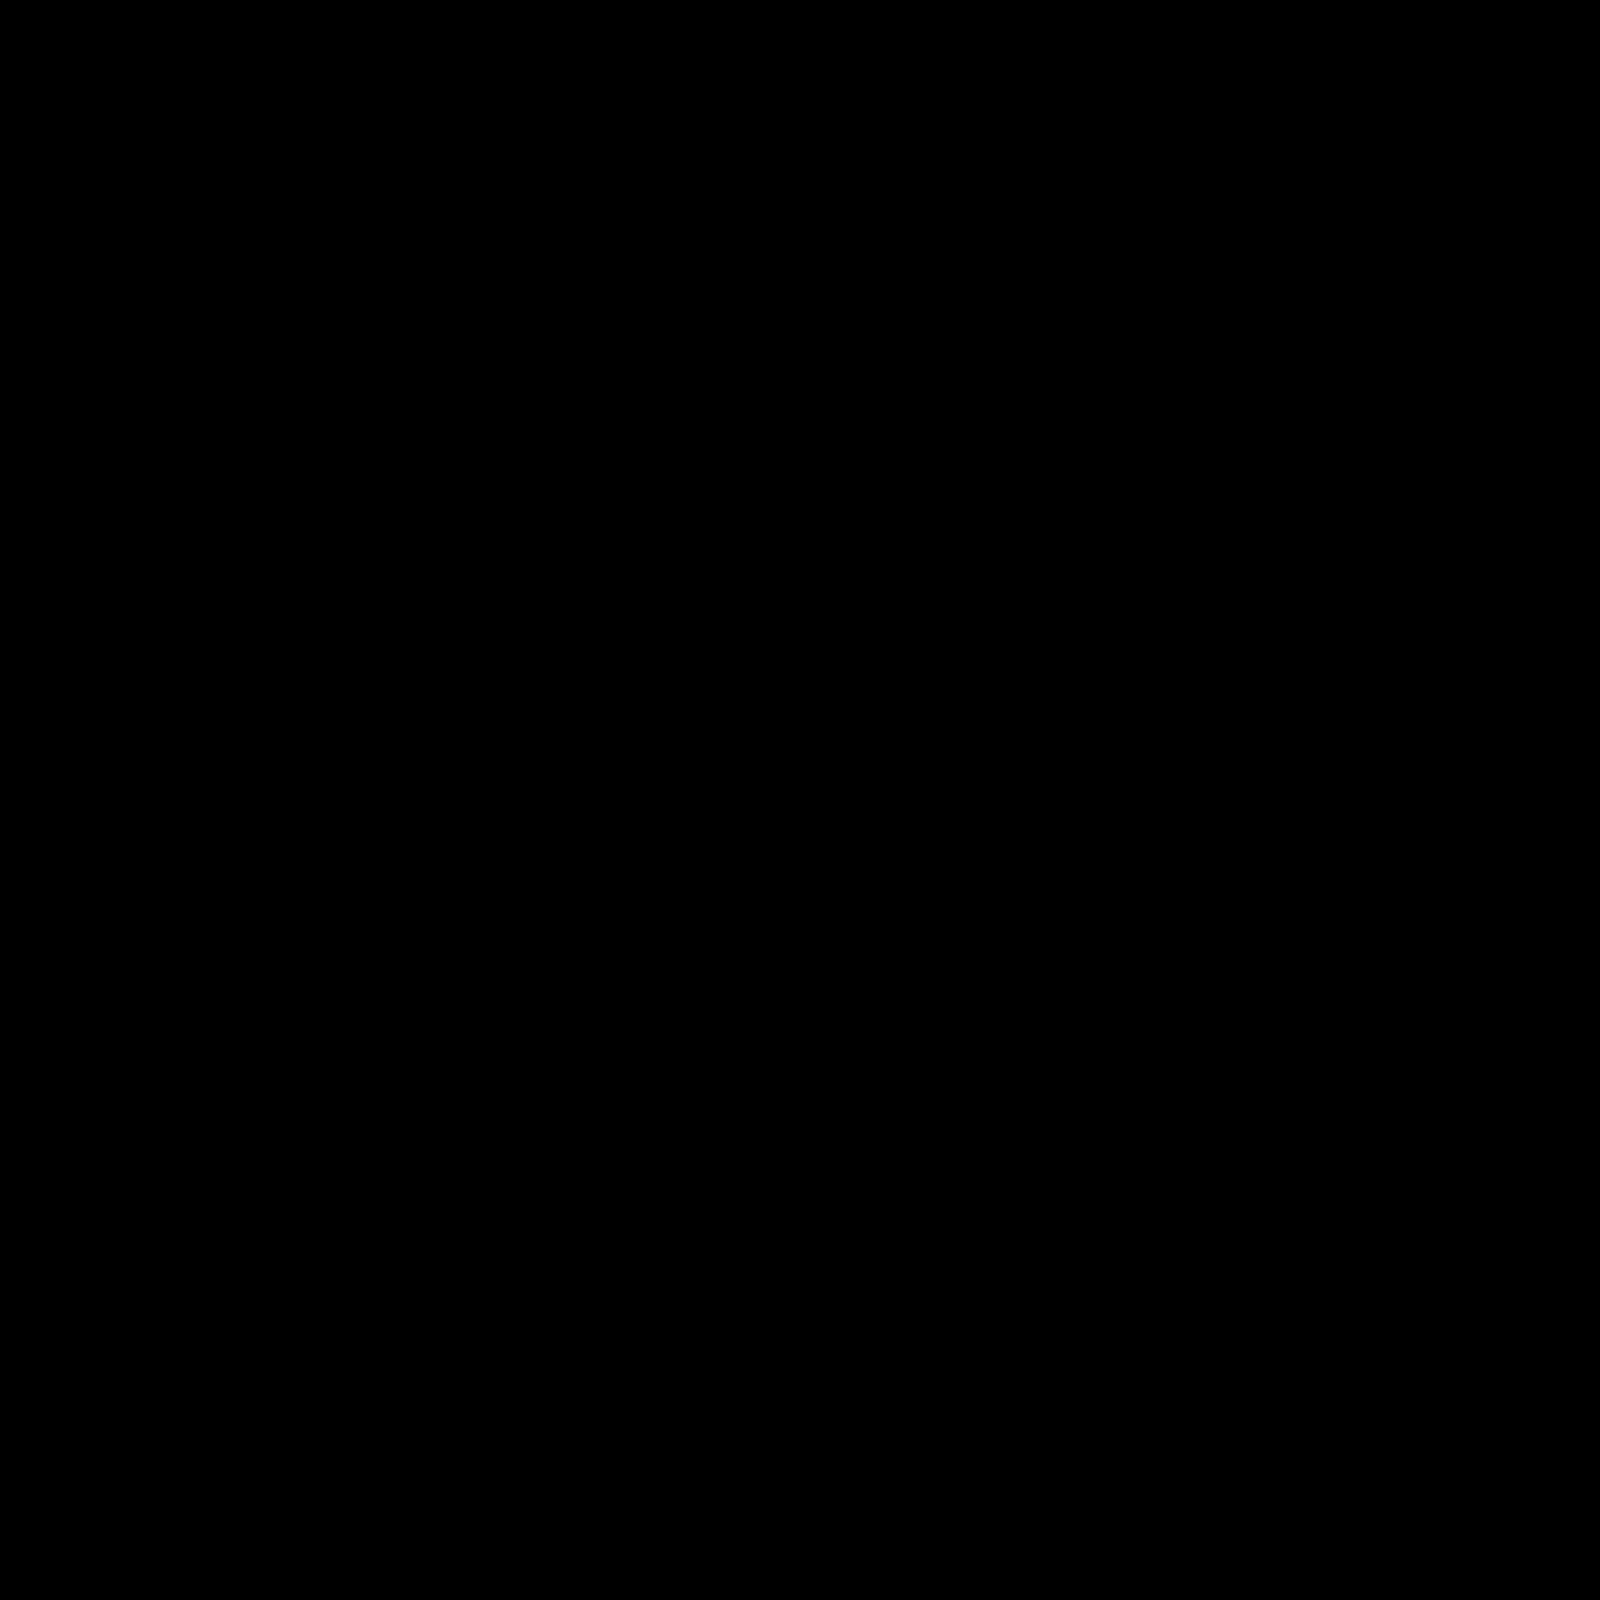 Zoosk icon